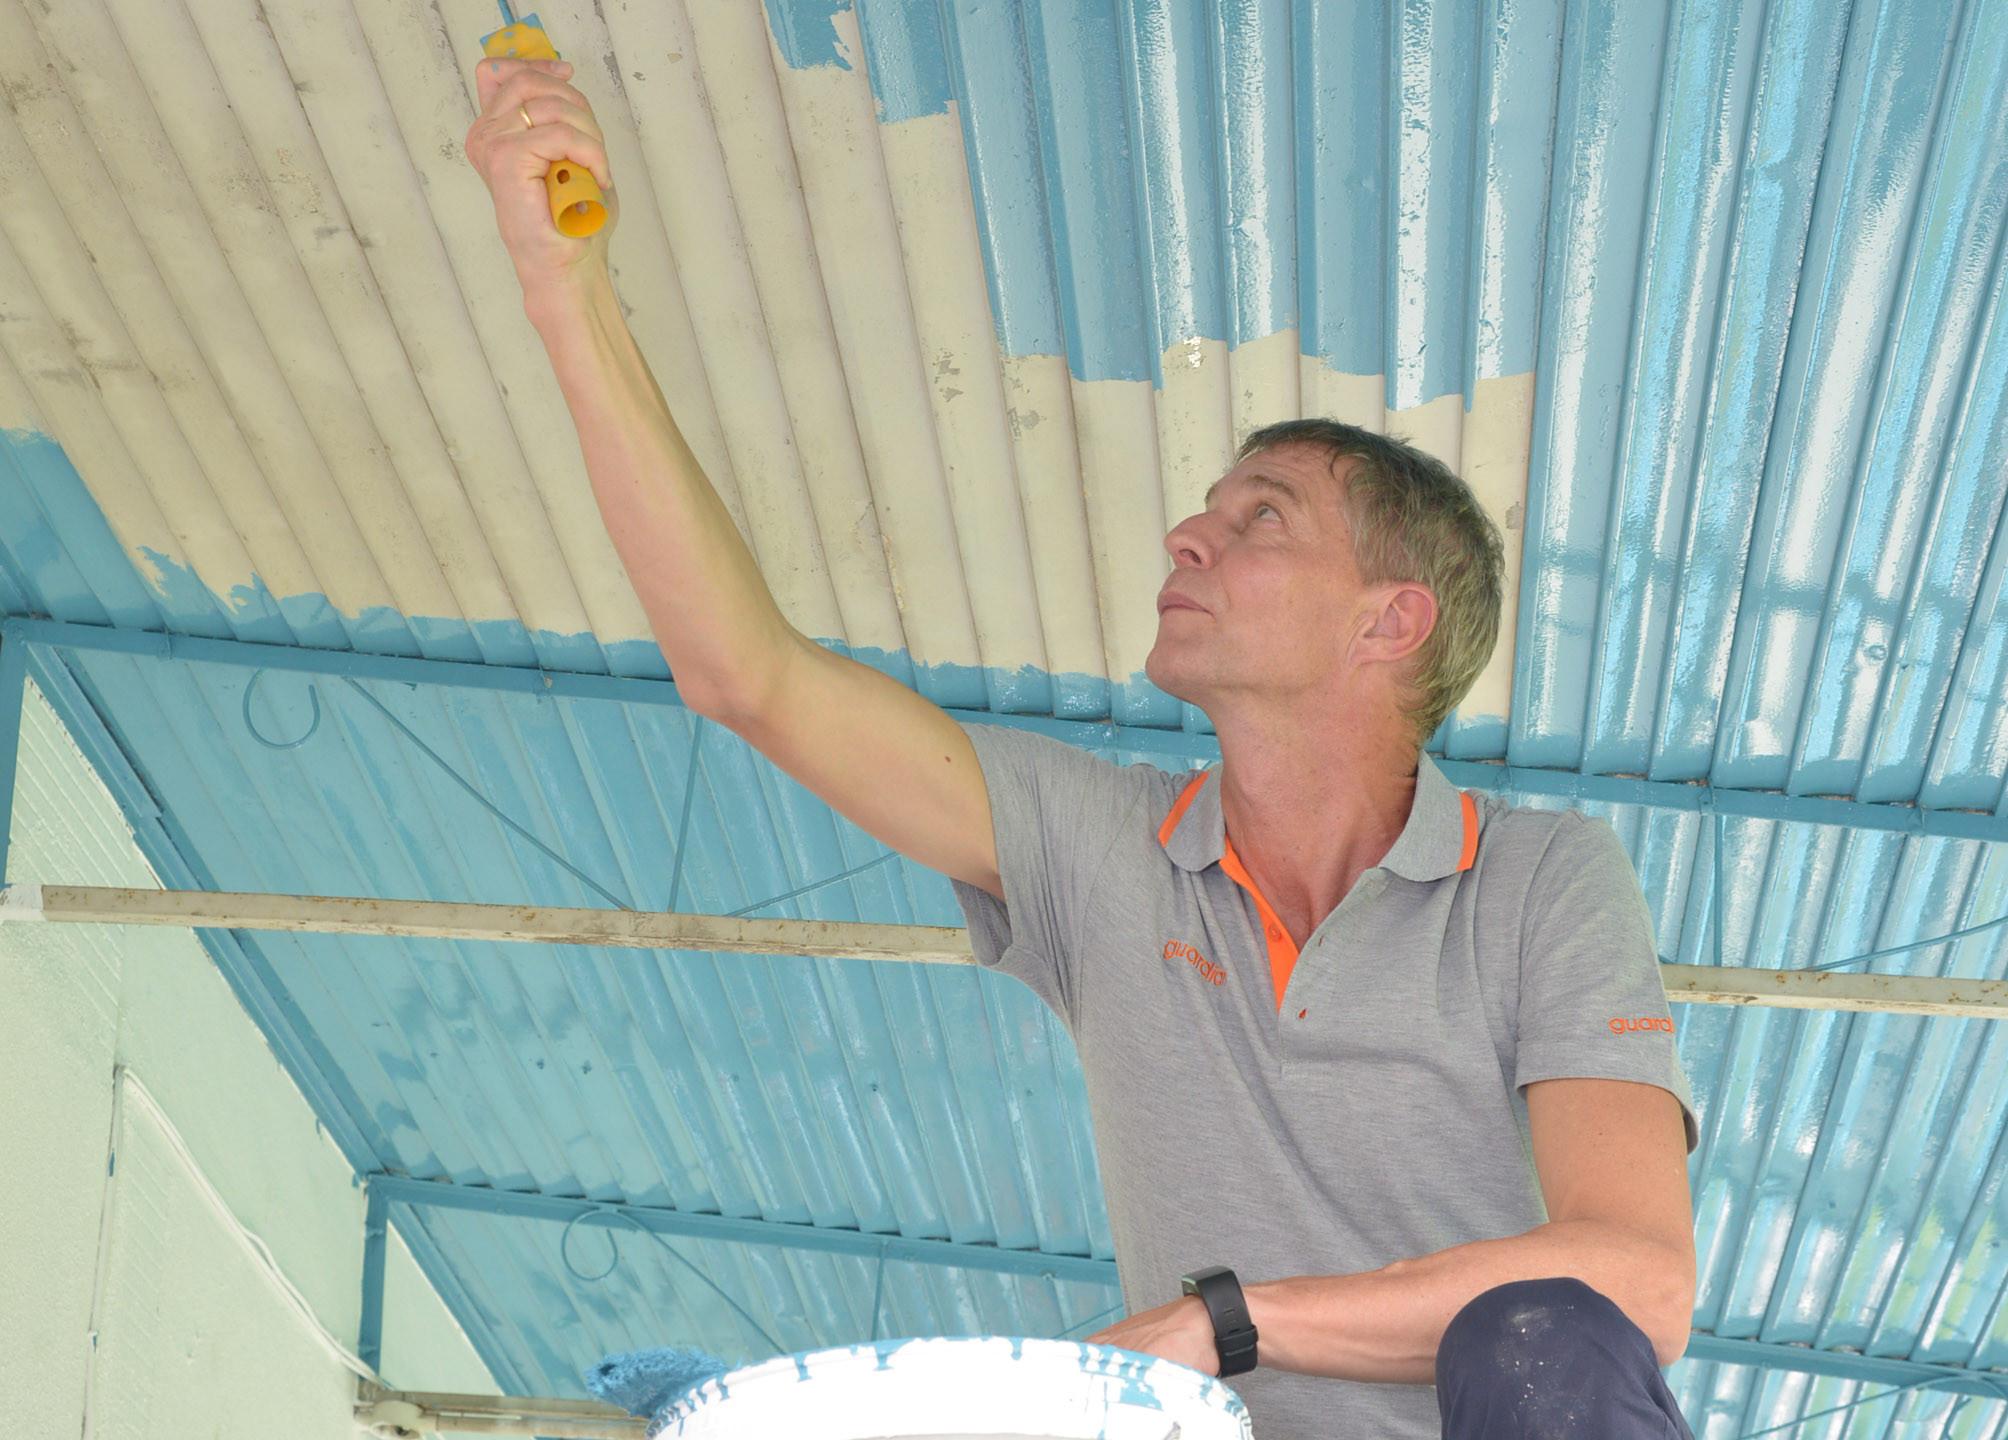 Leading by example, CEO Guardian Malaysia Mr Soren Lauridsen helping to repaint the roof of Pertubuhan   Kebajikan Anak Yatim Mary